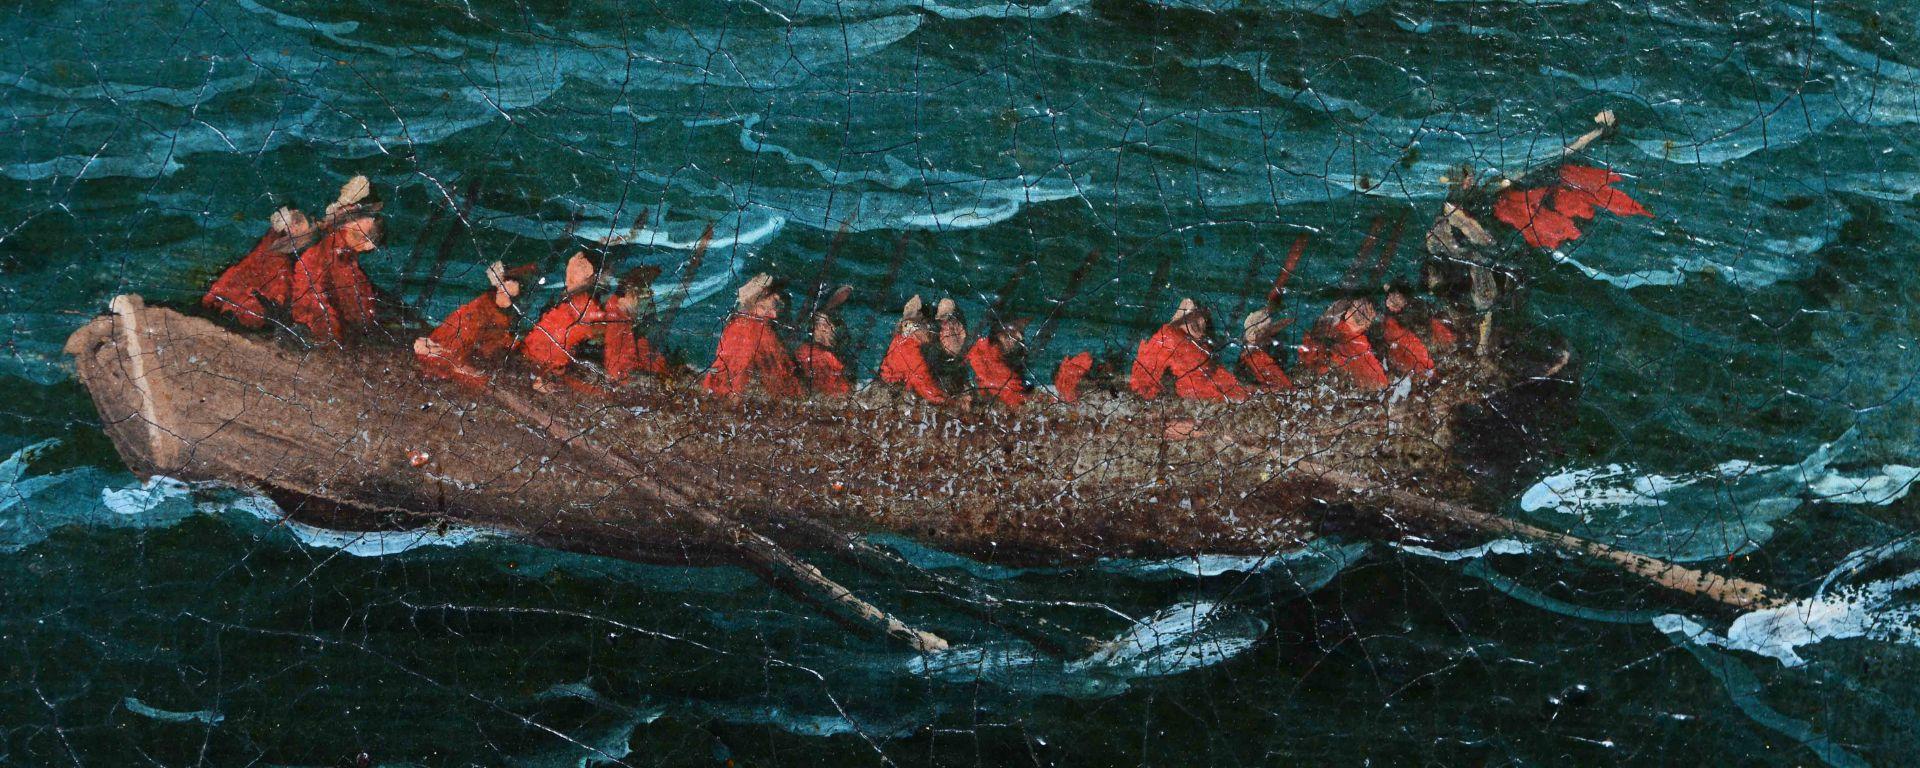 KAUW, ALBRECHT I: Die Seeschlacht. - Image 7 of 13